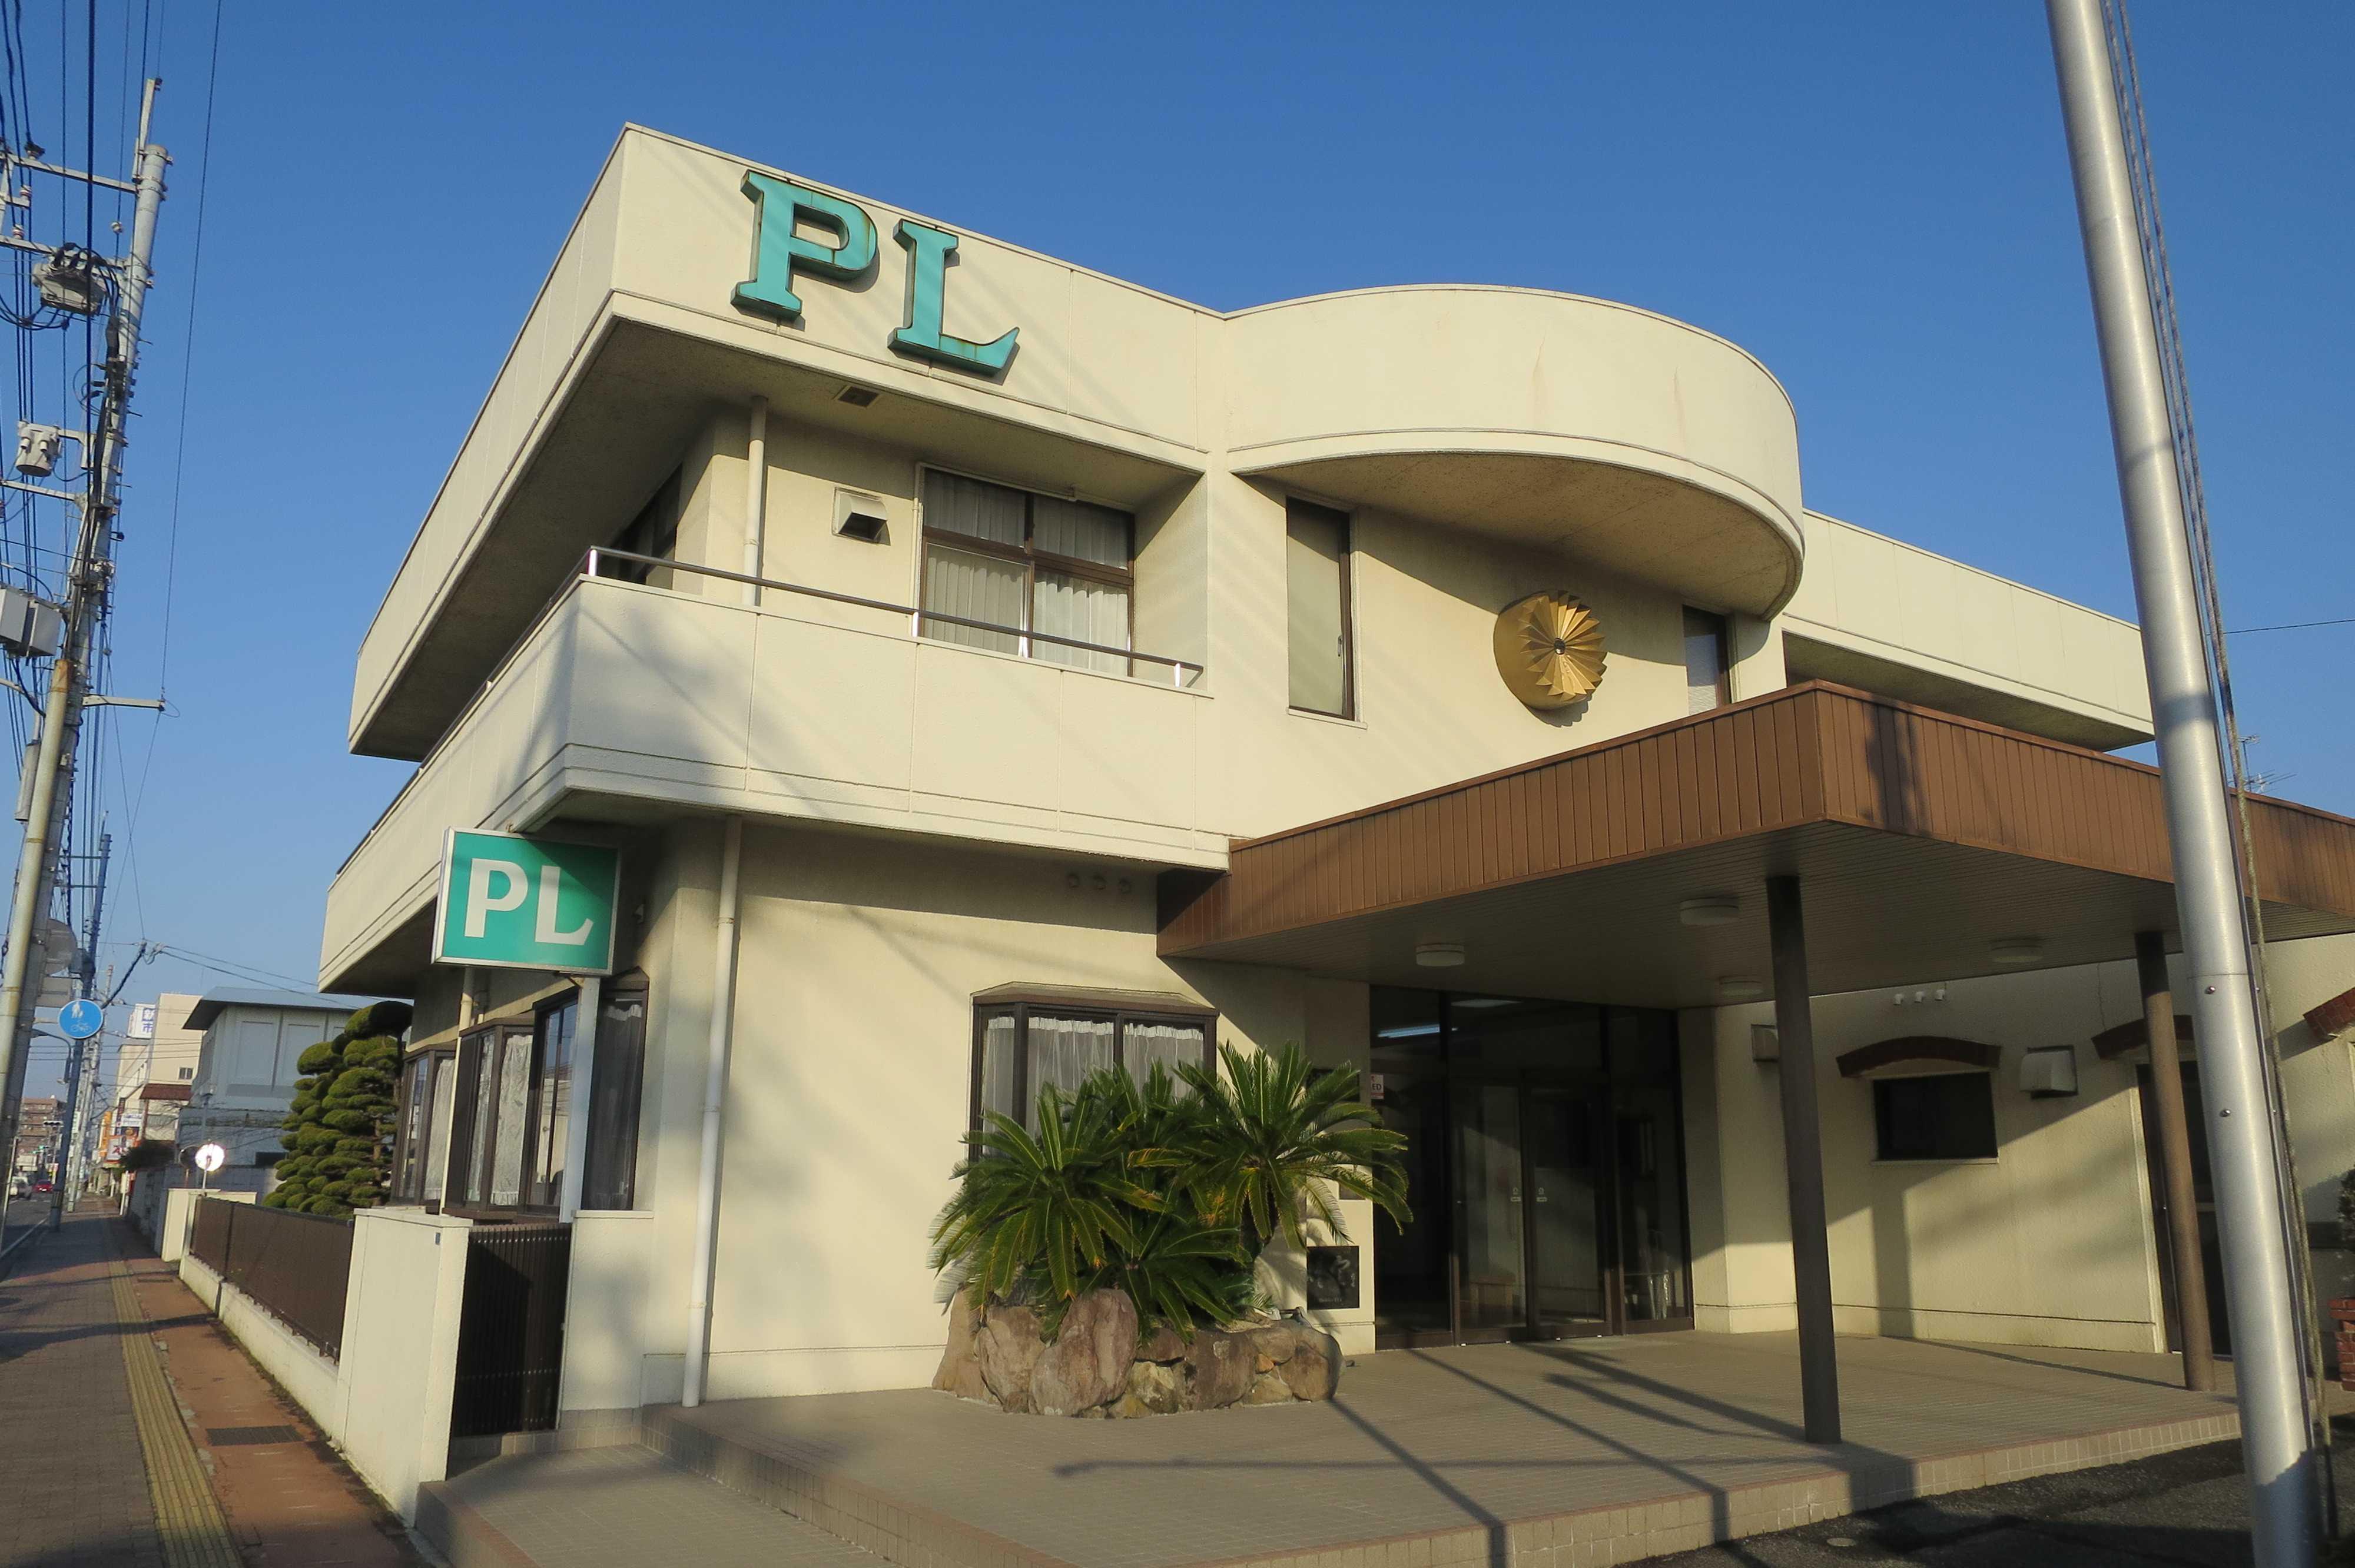 PL教団(パーフェクトリバティー教団)の建物